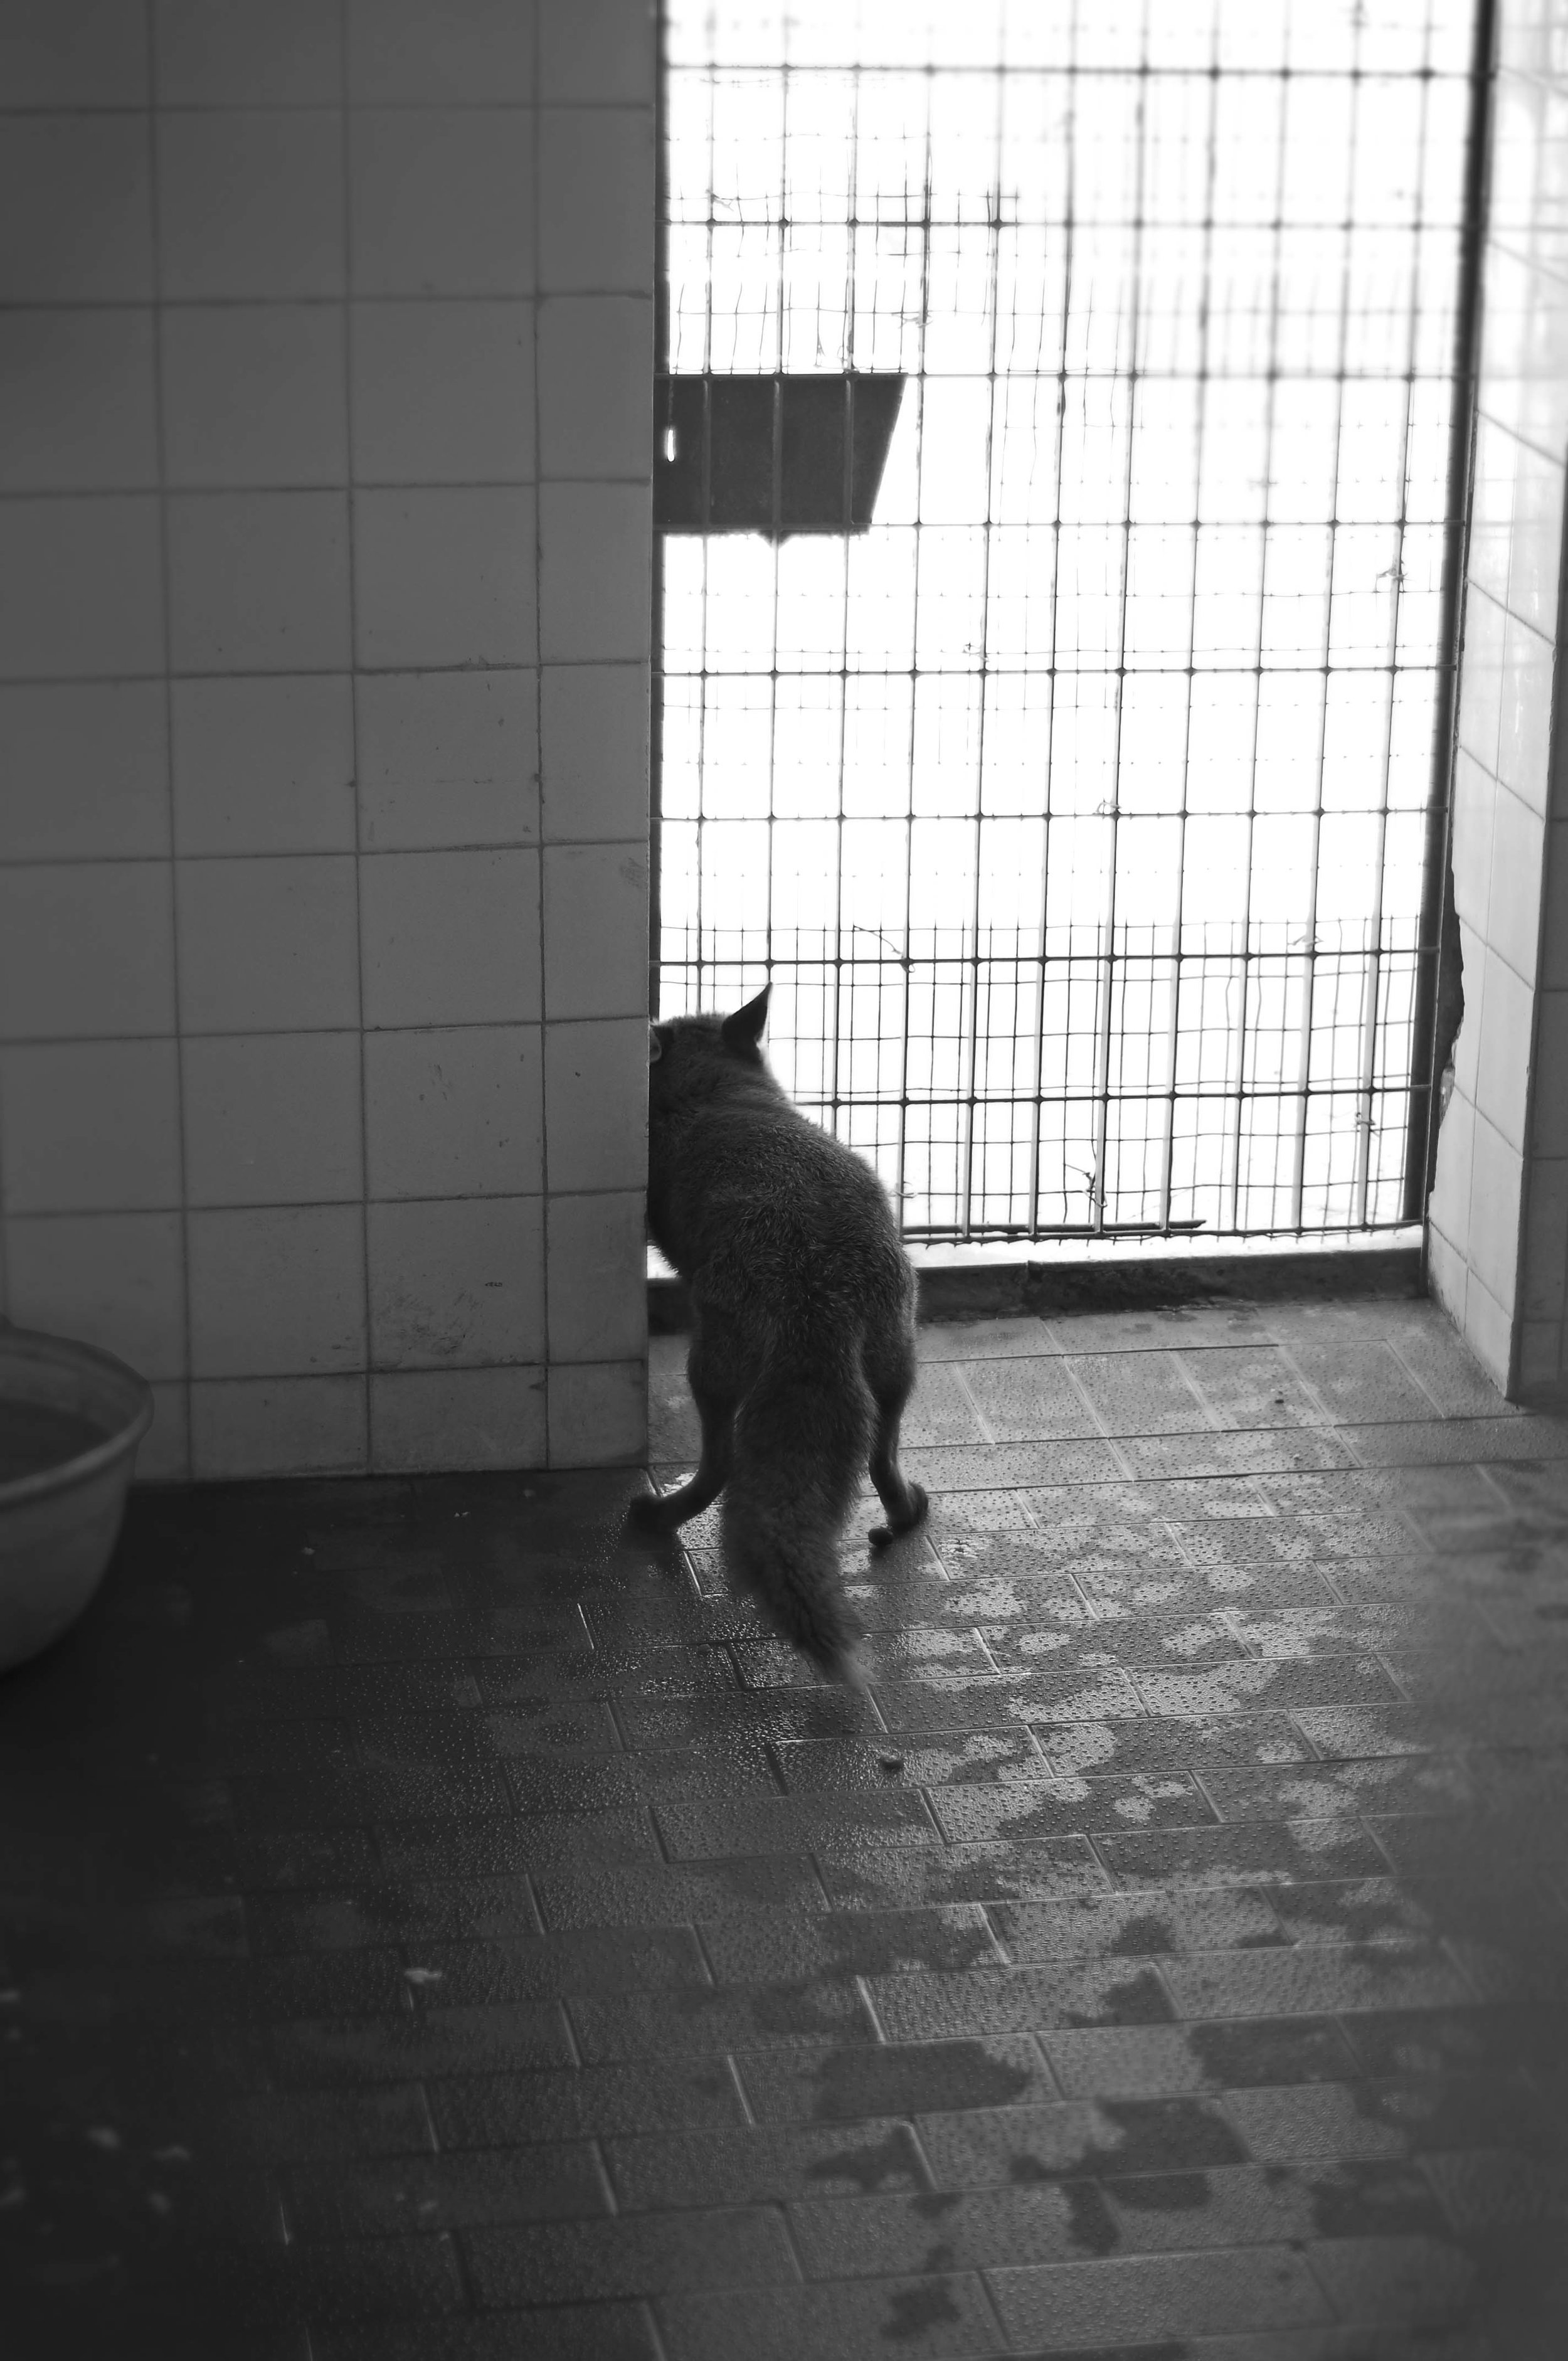 sad animals #10